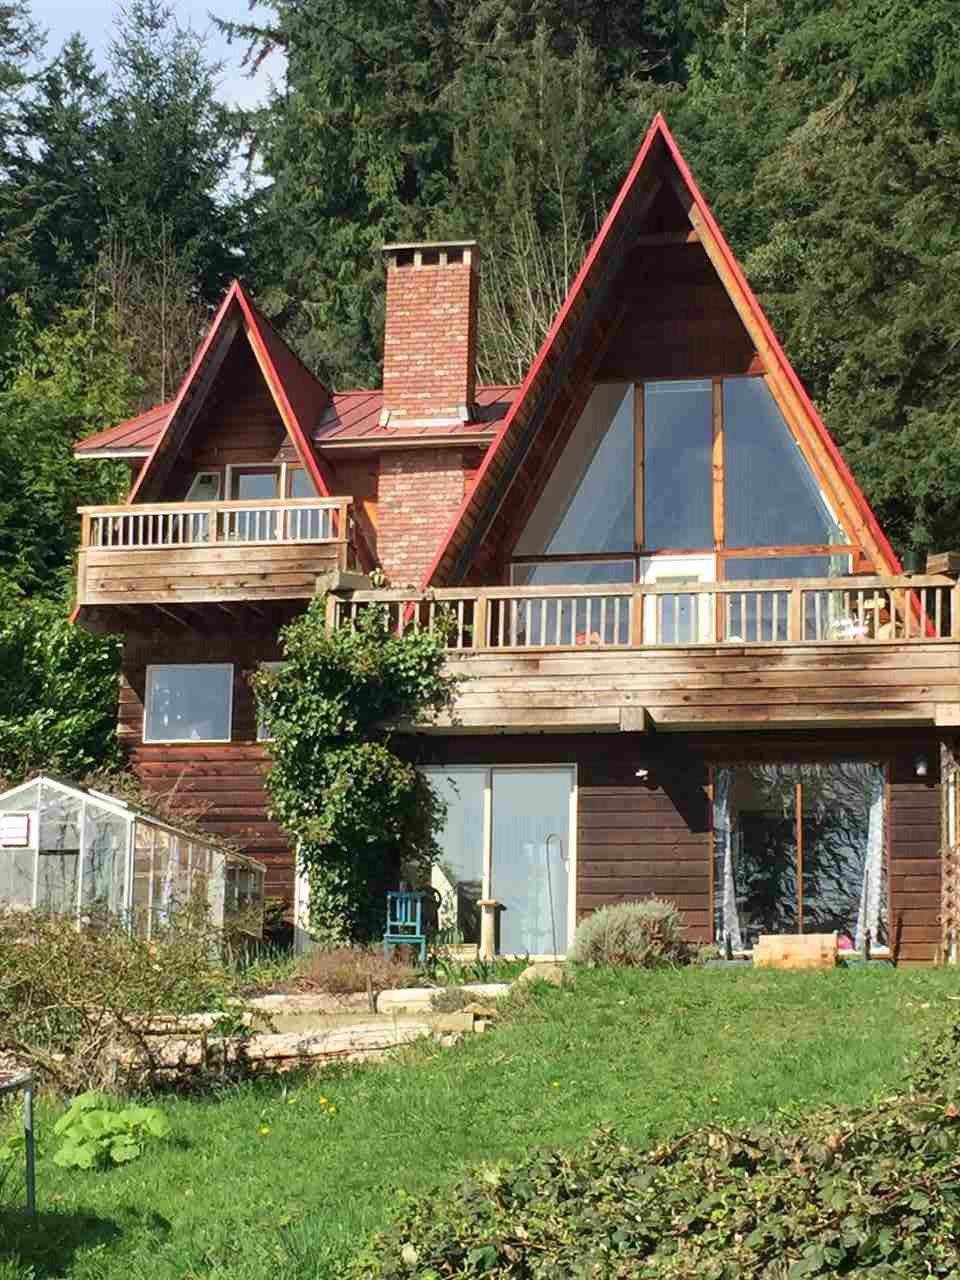 Photo 6: Photos: 2477 MILLINER Road: Roberts Creek House for sale (Sunshine Coast)  : MLS®# R2155266